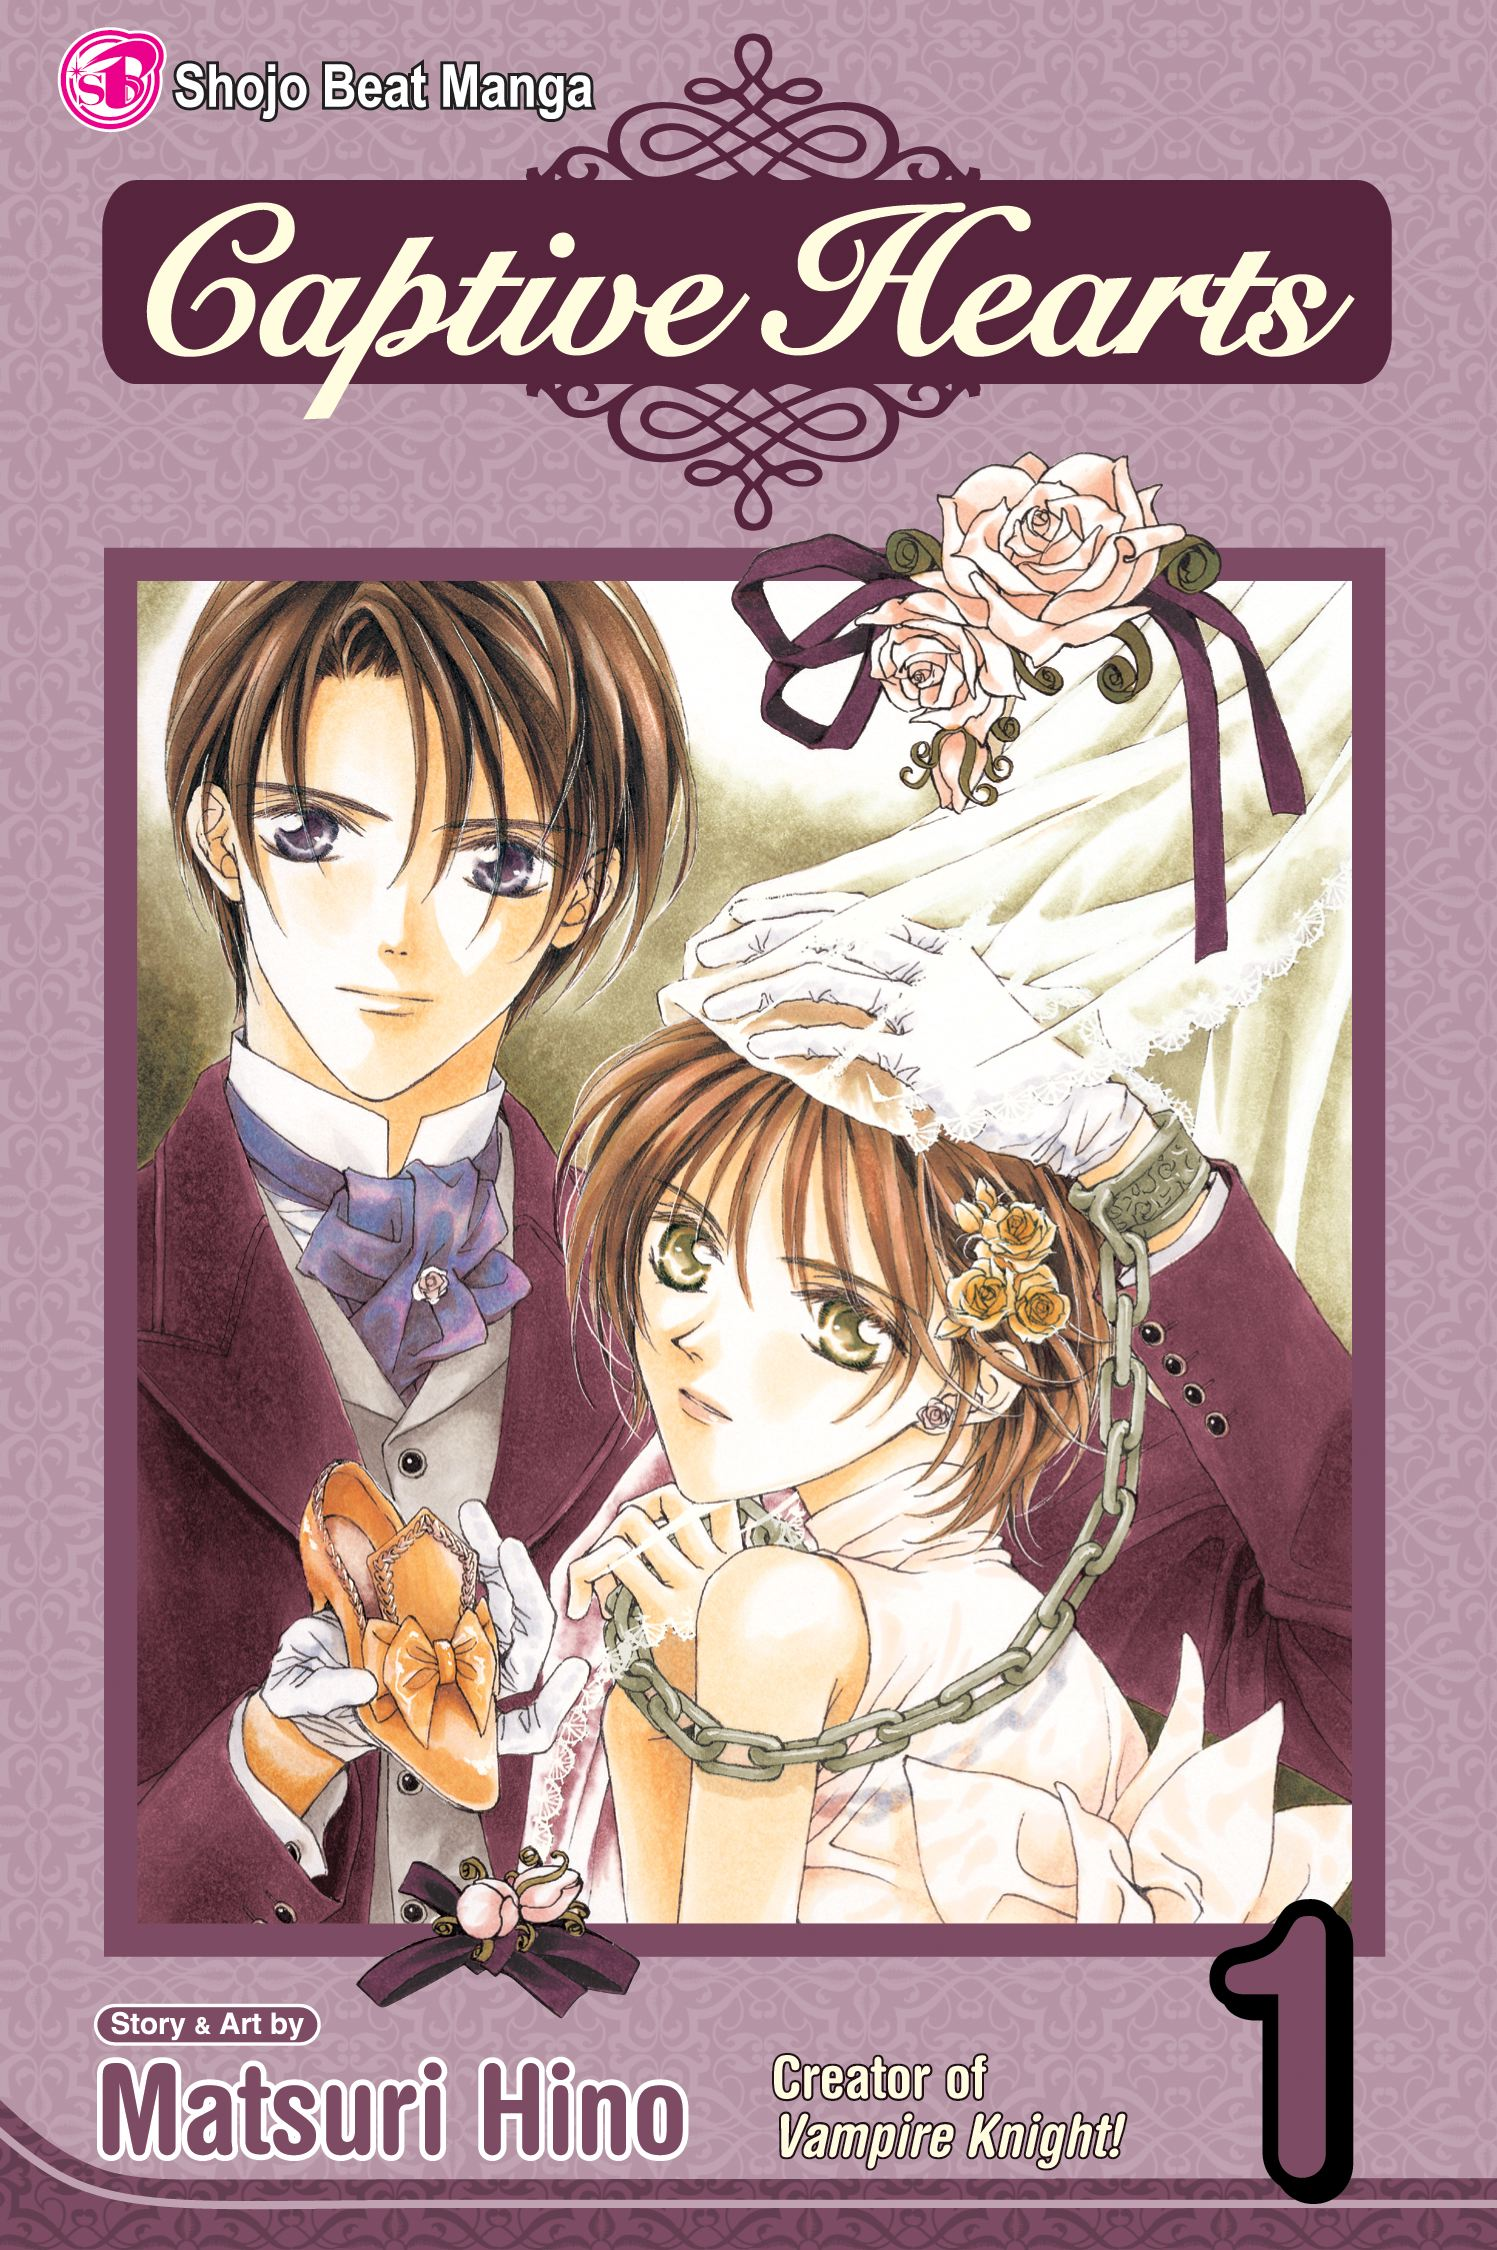 Book Cover Image (jpg): Captive Hearts, Vol. 1